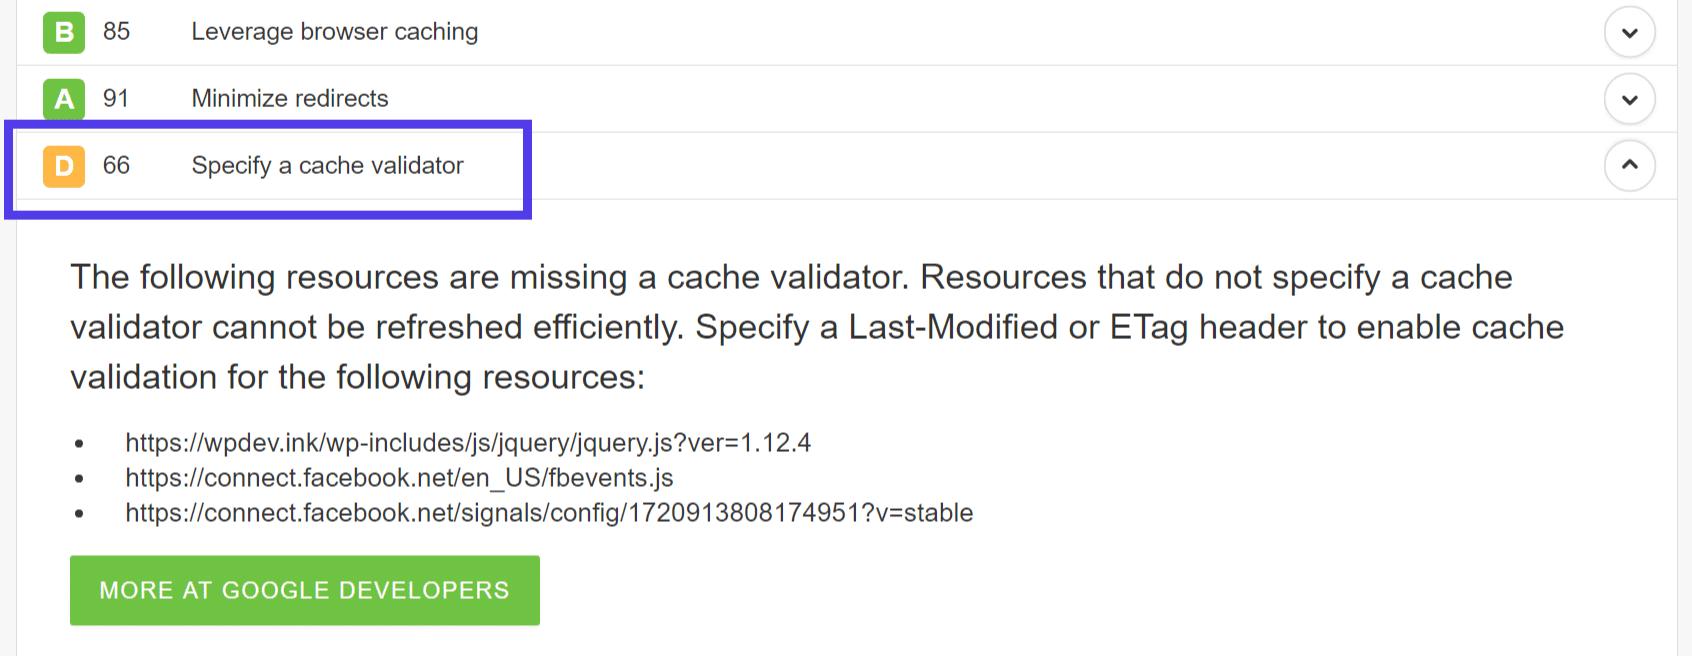 L'avviso Specify a cache validator